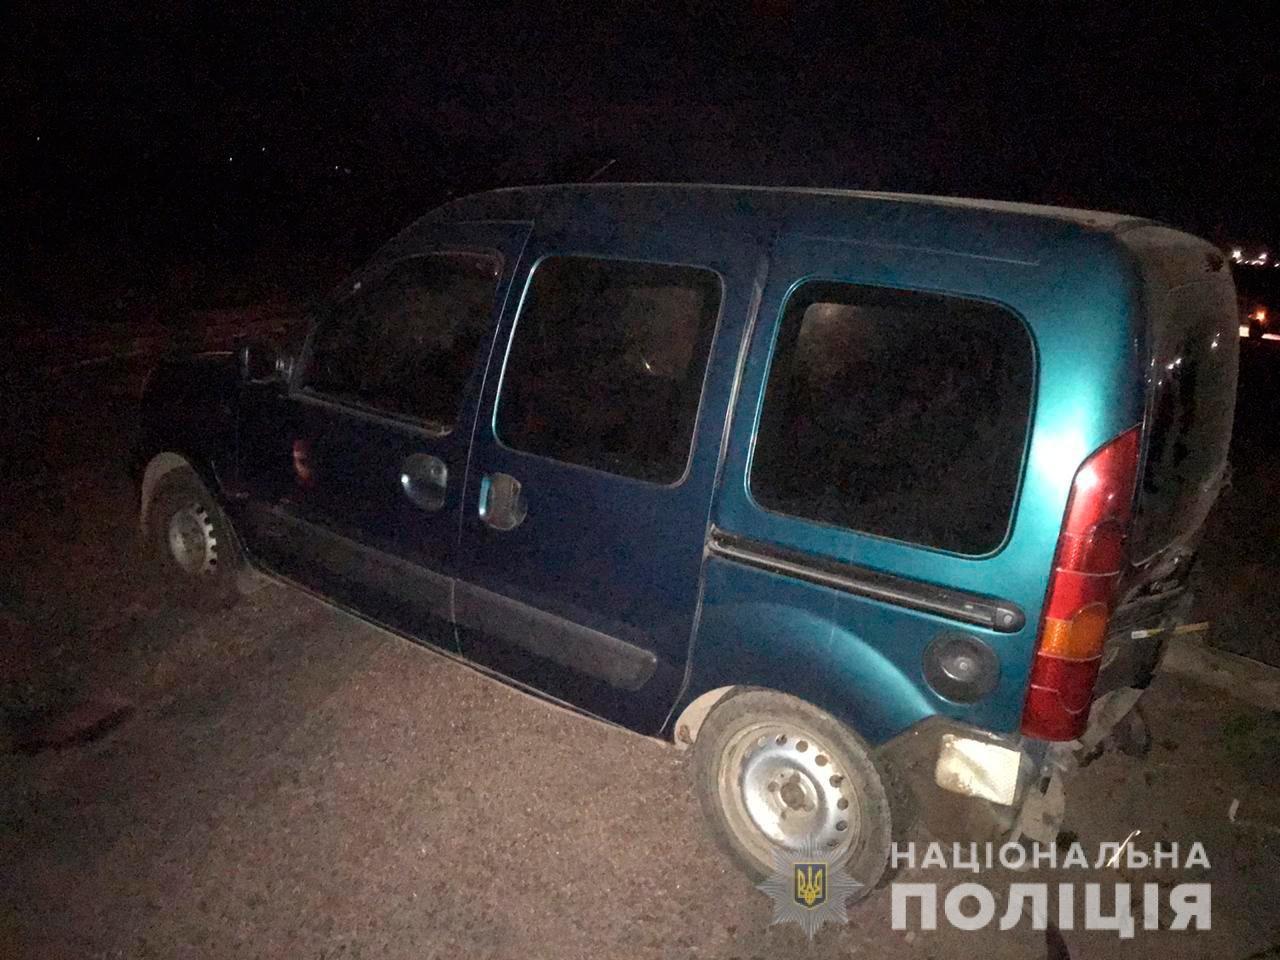 На Николаевщине за сутки в одном районе в авариях пострадало три человека, - ФОТО, фото-2